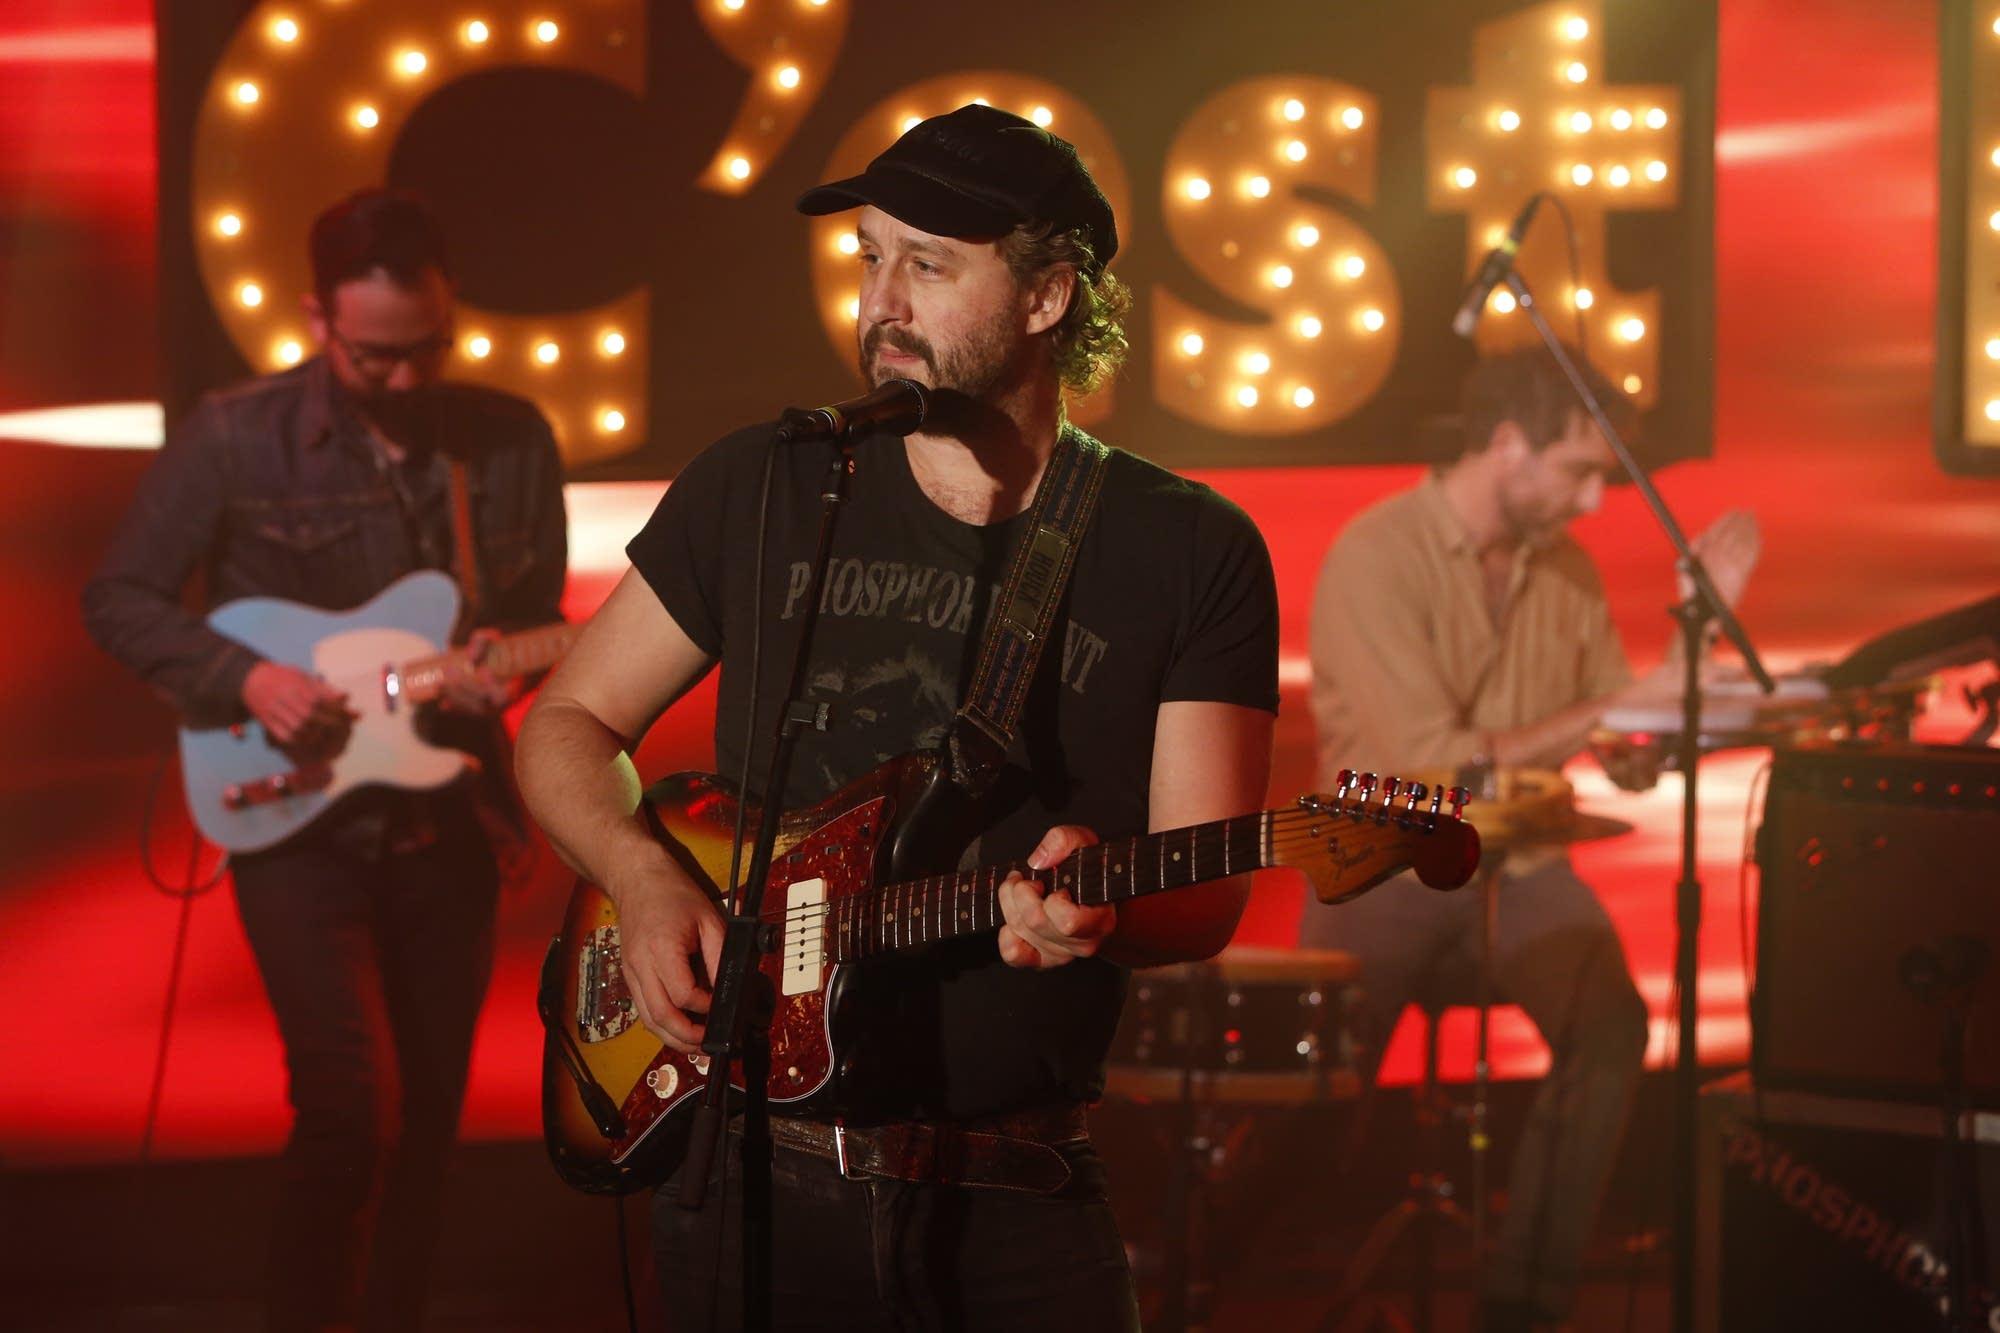 Music on TV this week: Phosphorescent